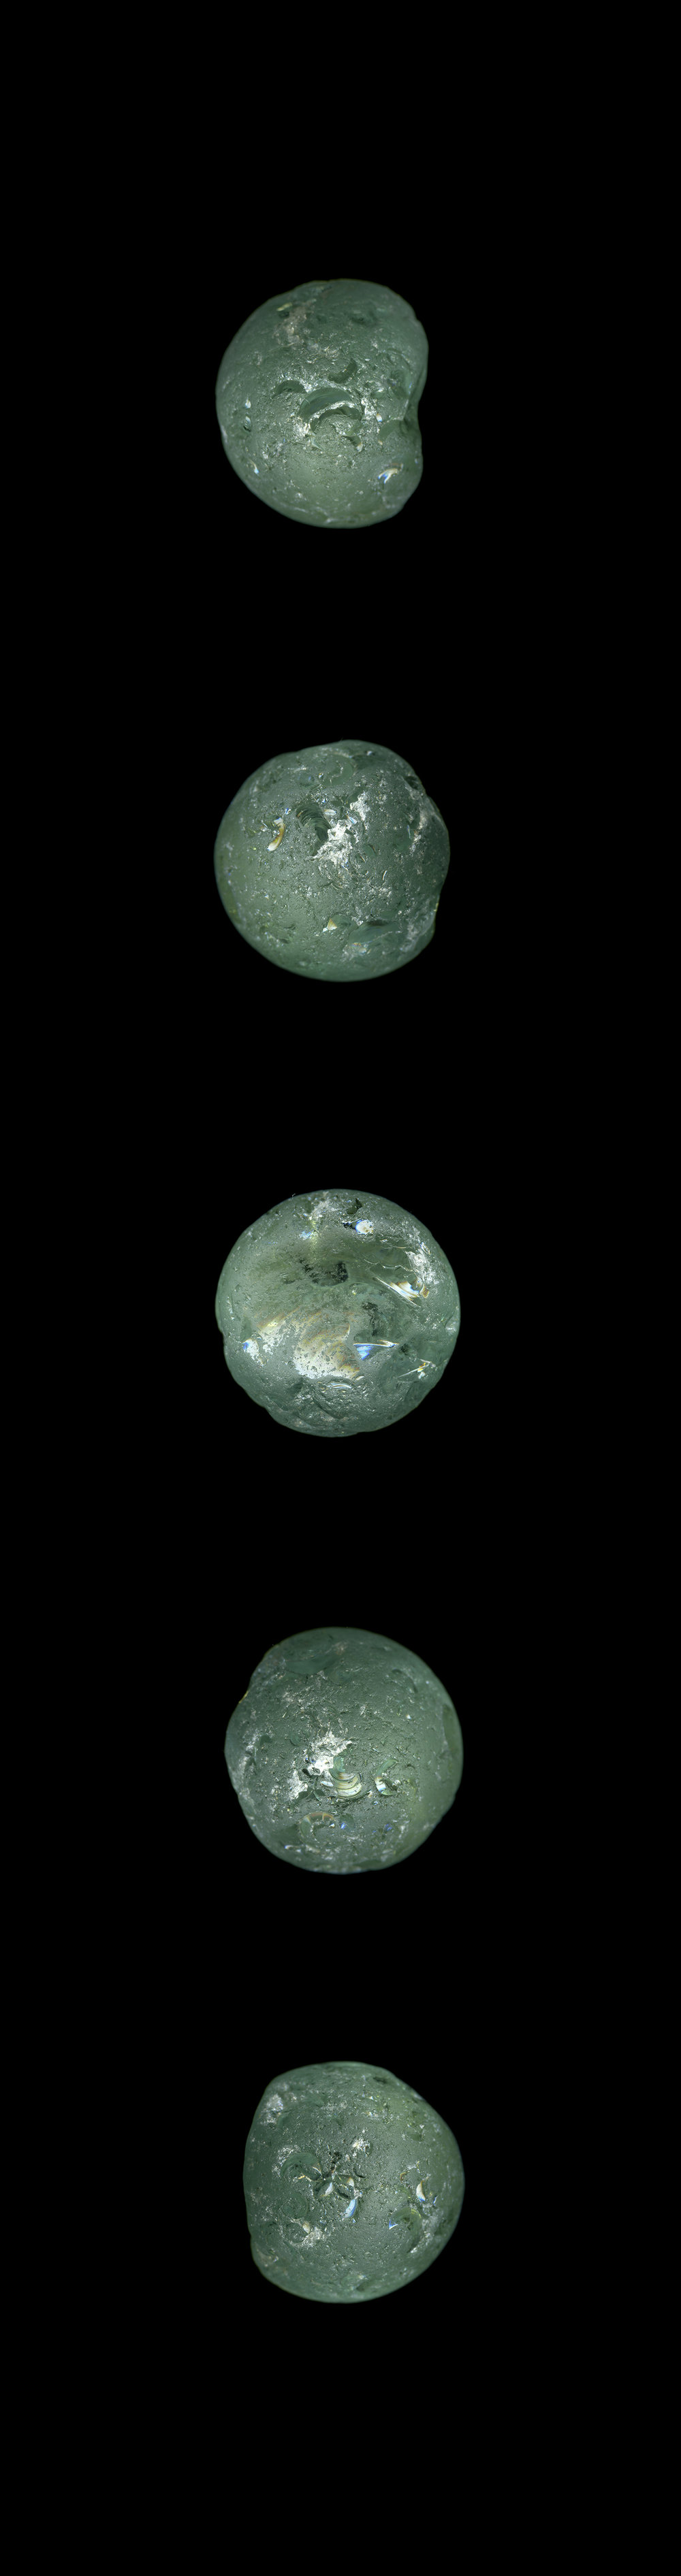 CS-moon.jpg